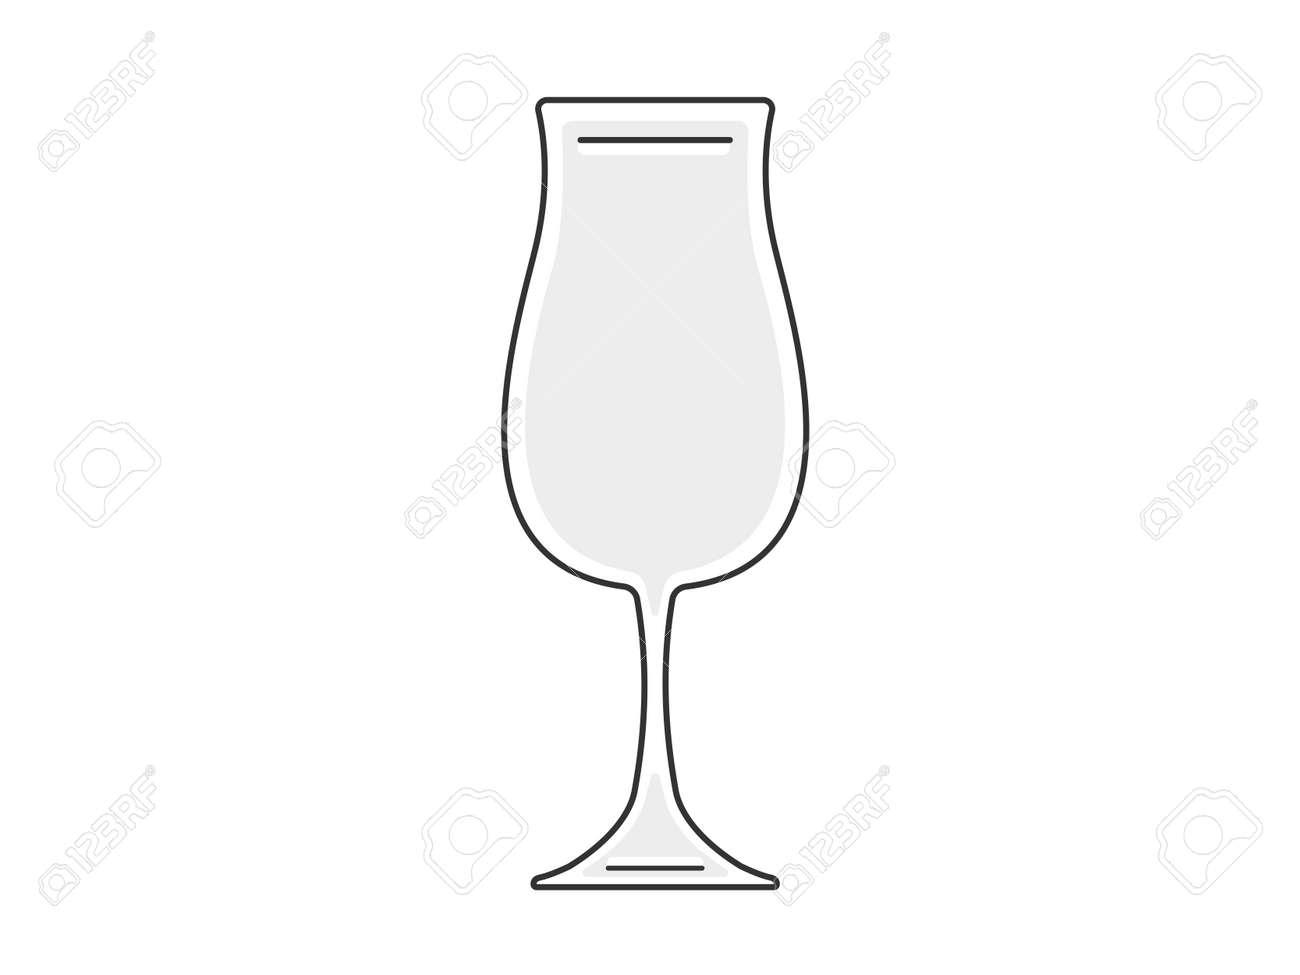 Cocktail glass illustration - 166492375